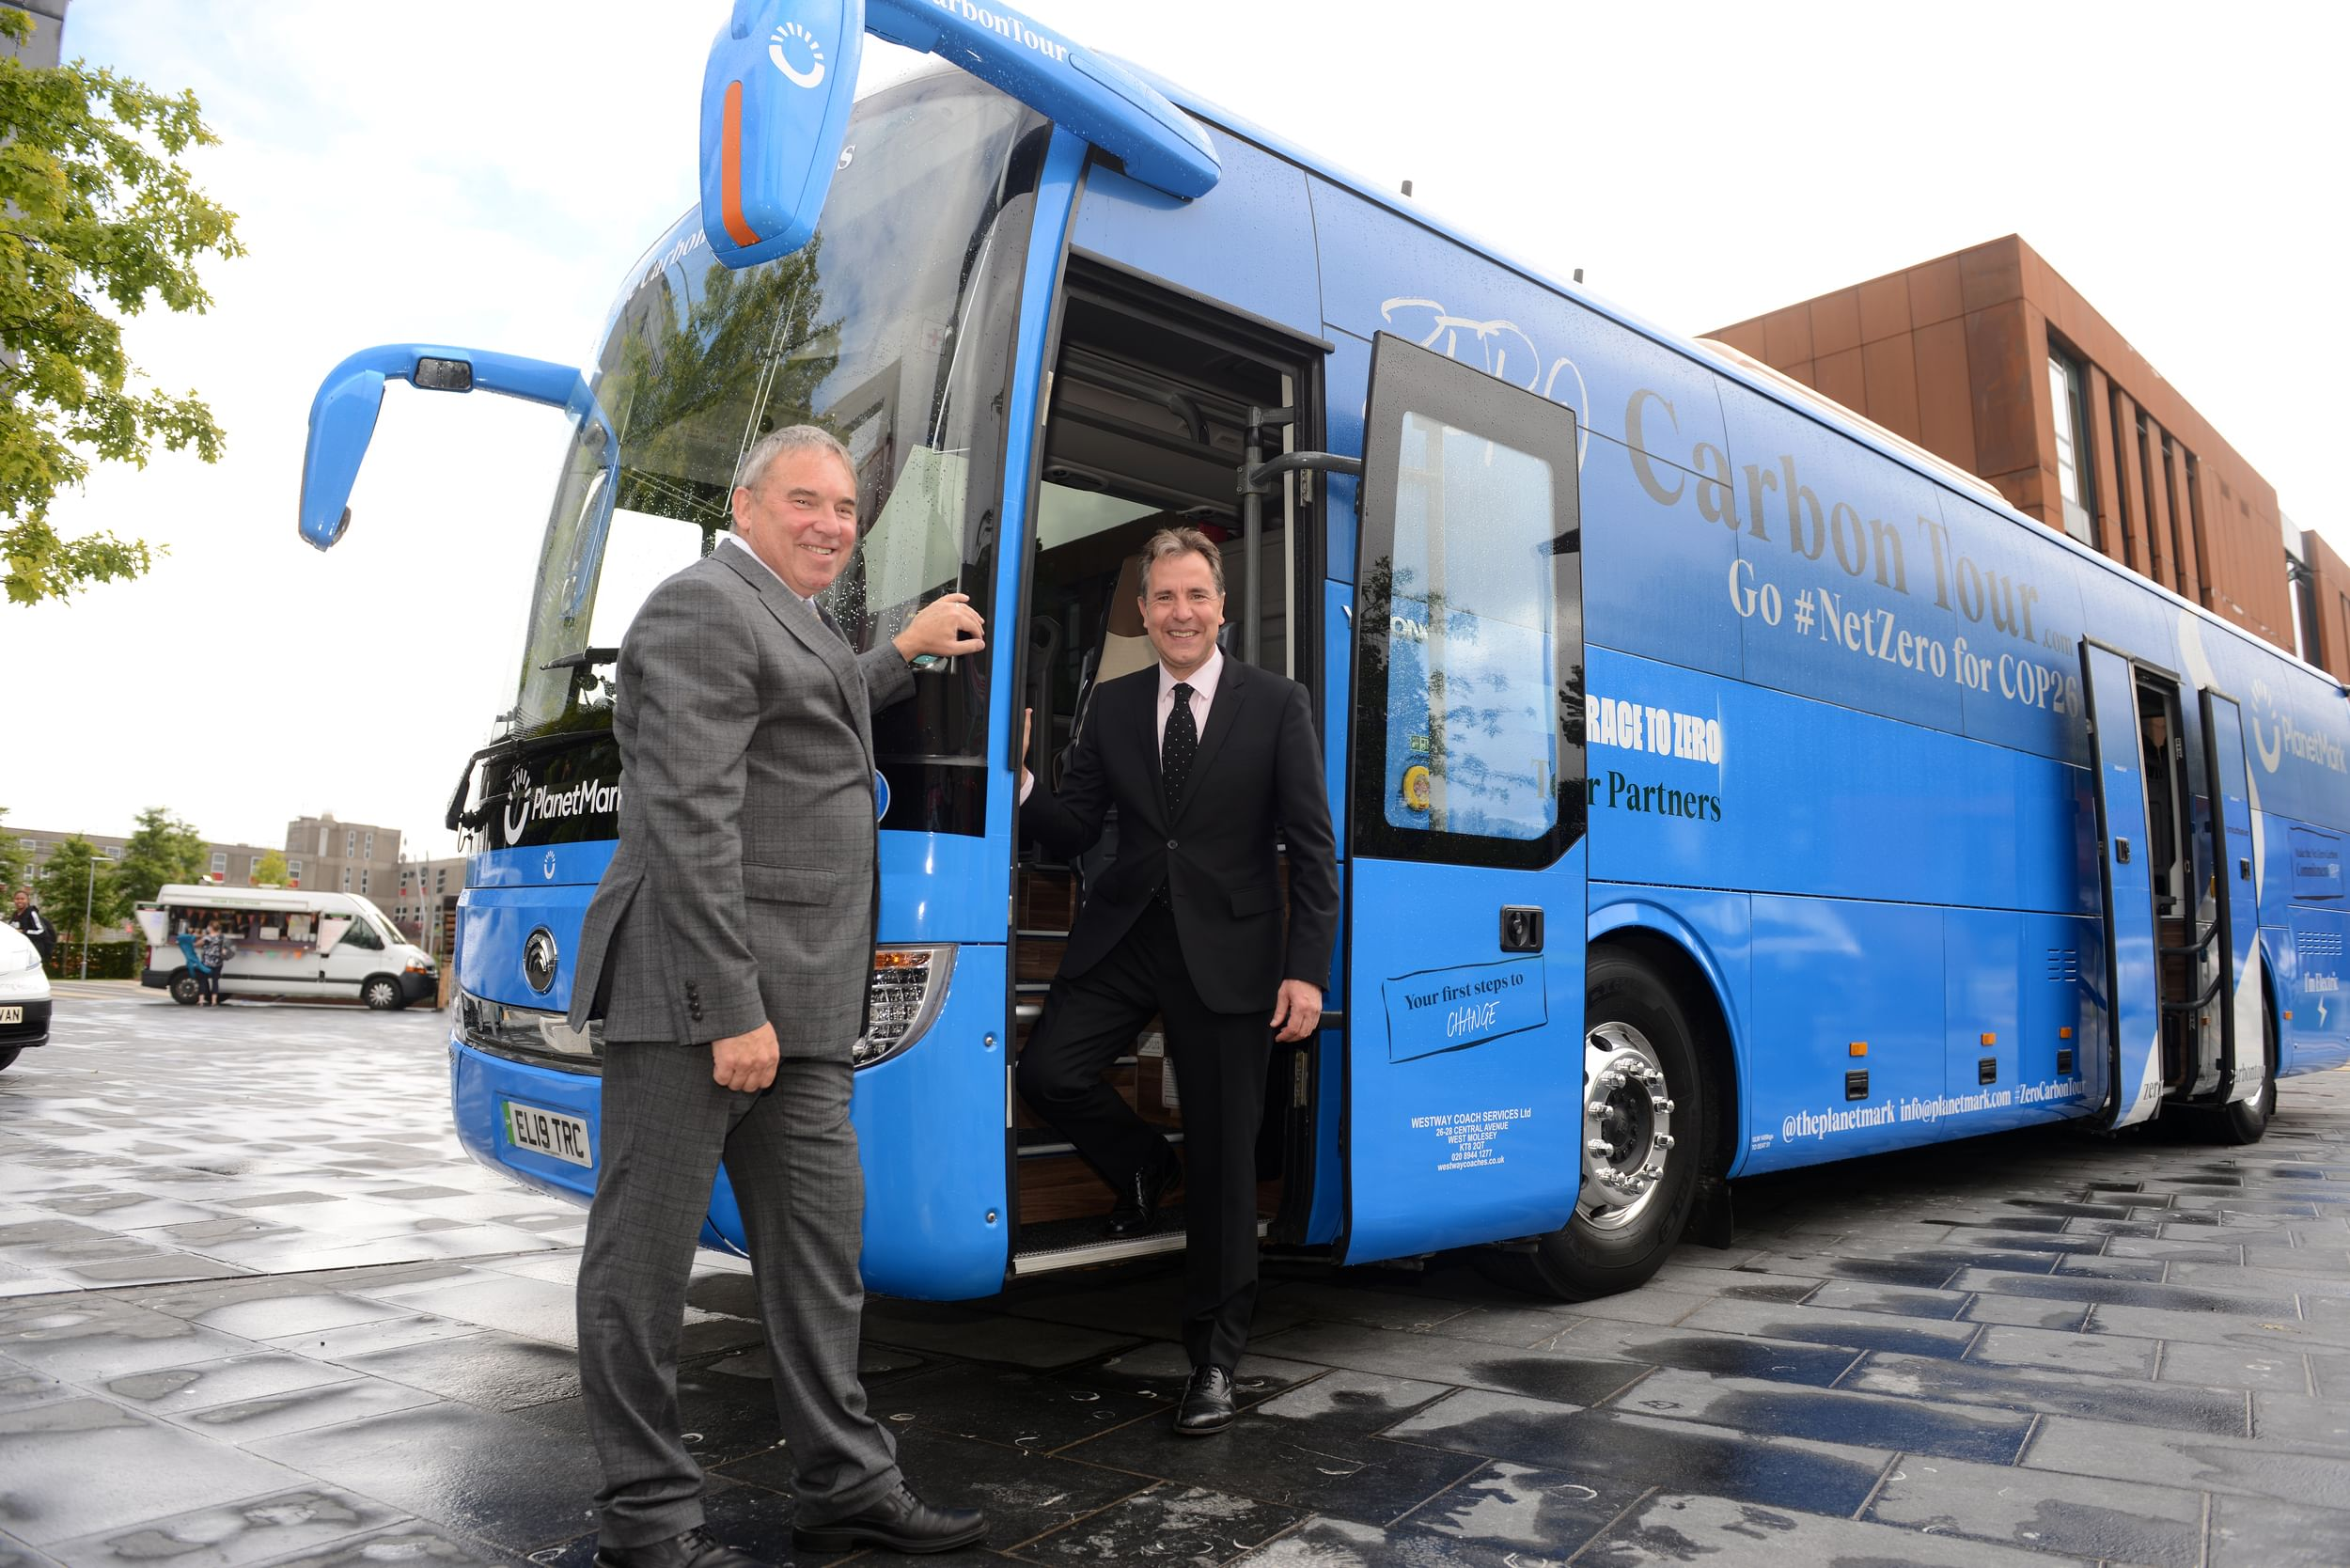 Metro Mayor Dan Norris with a blue Carbon bus